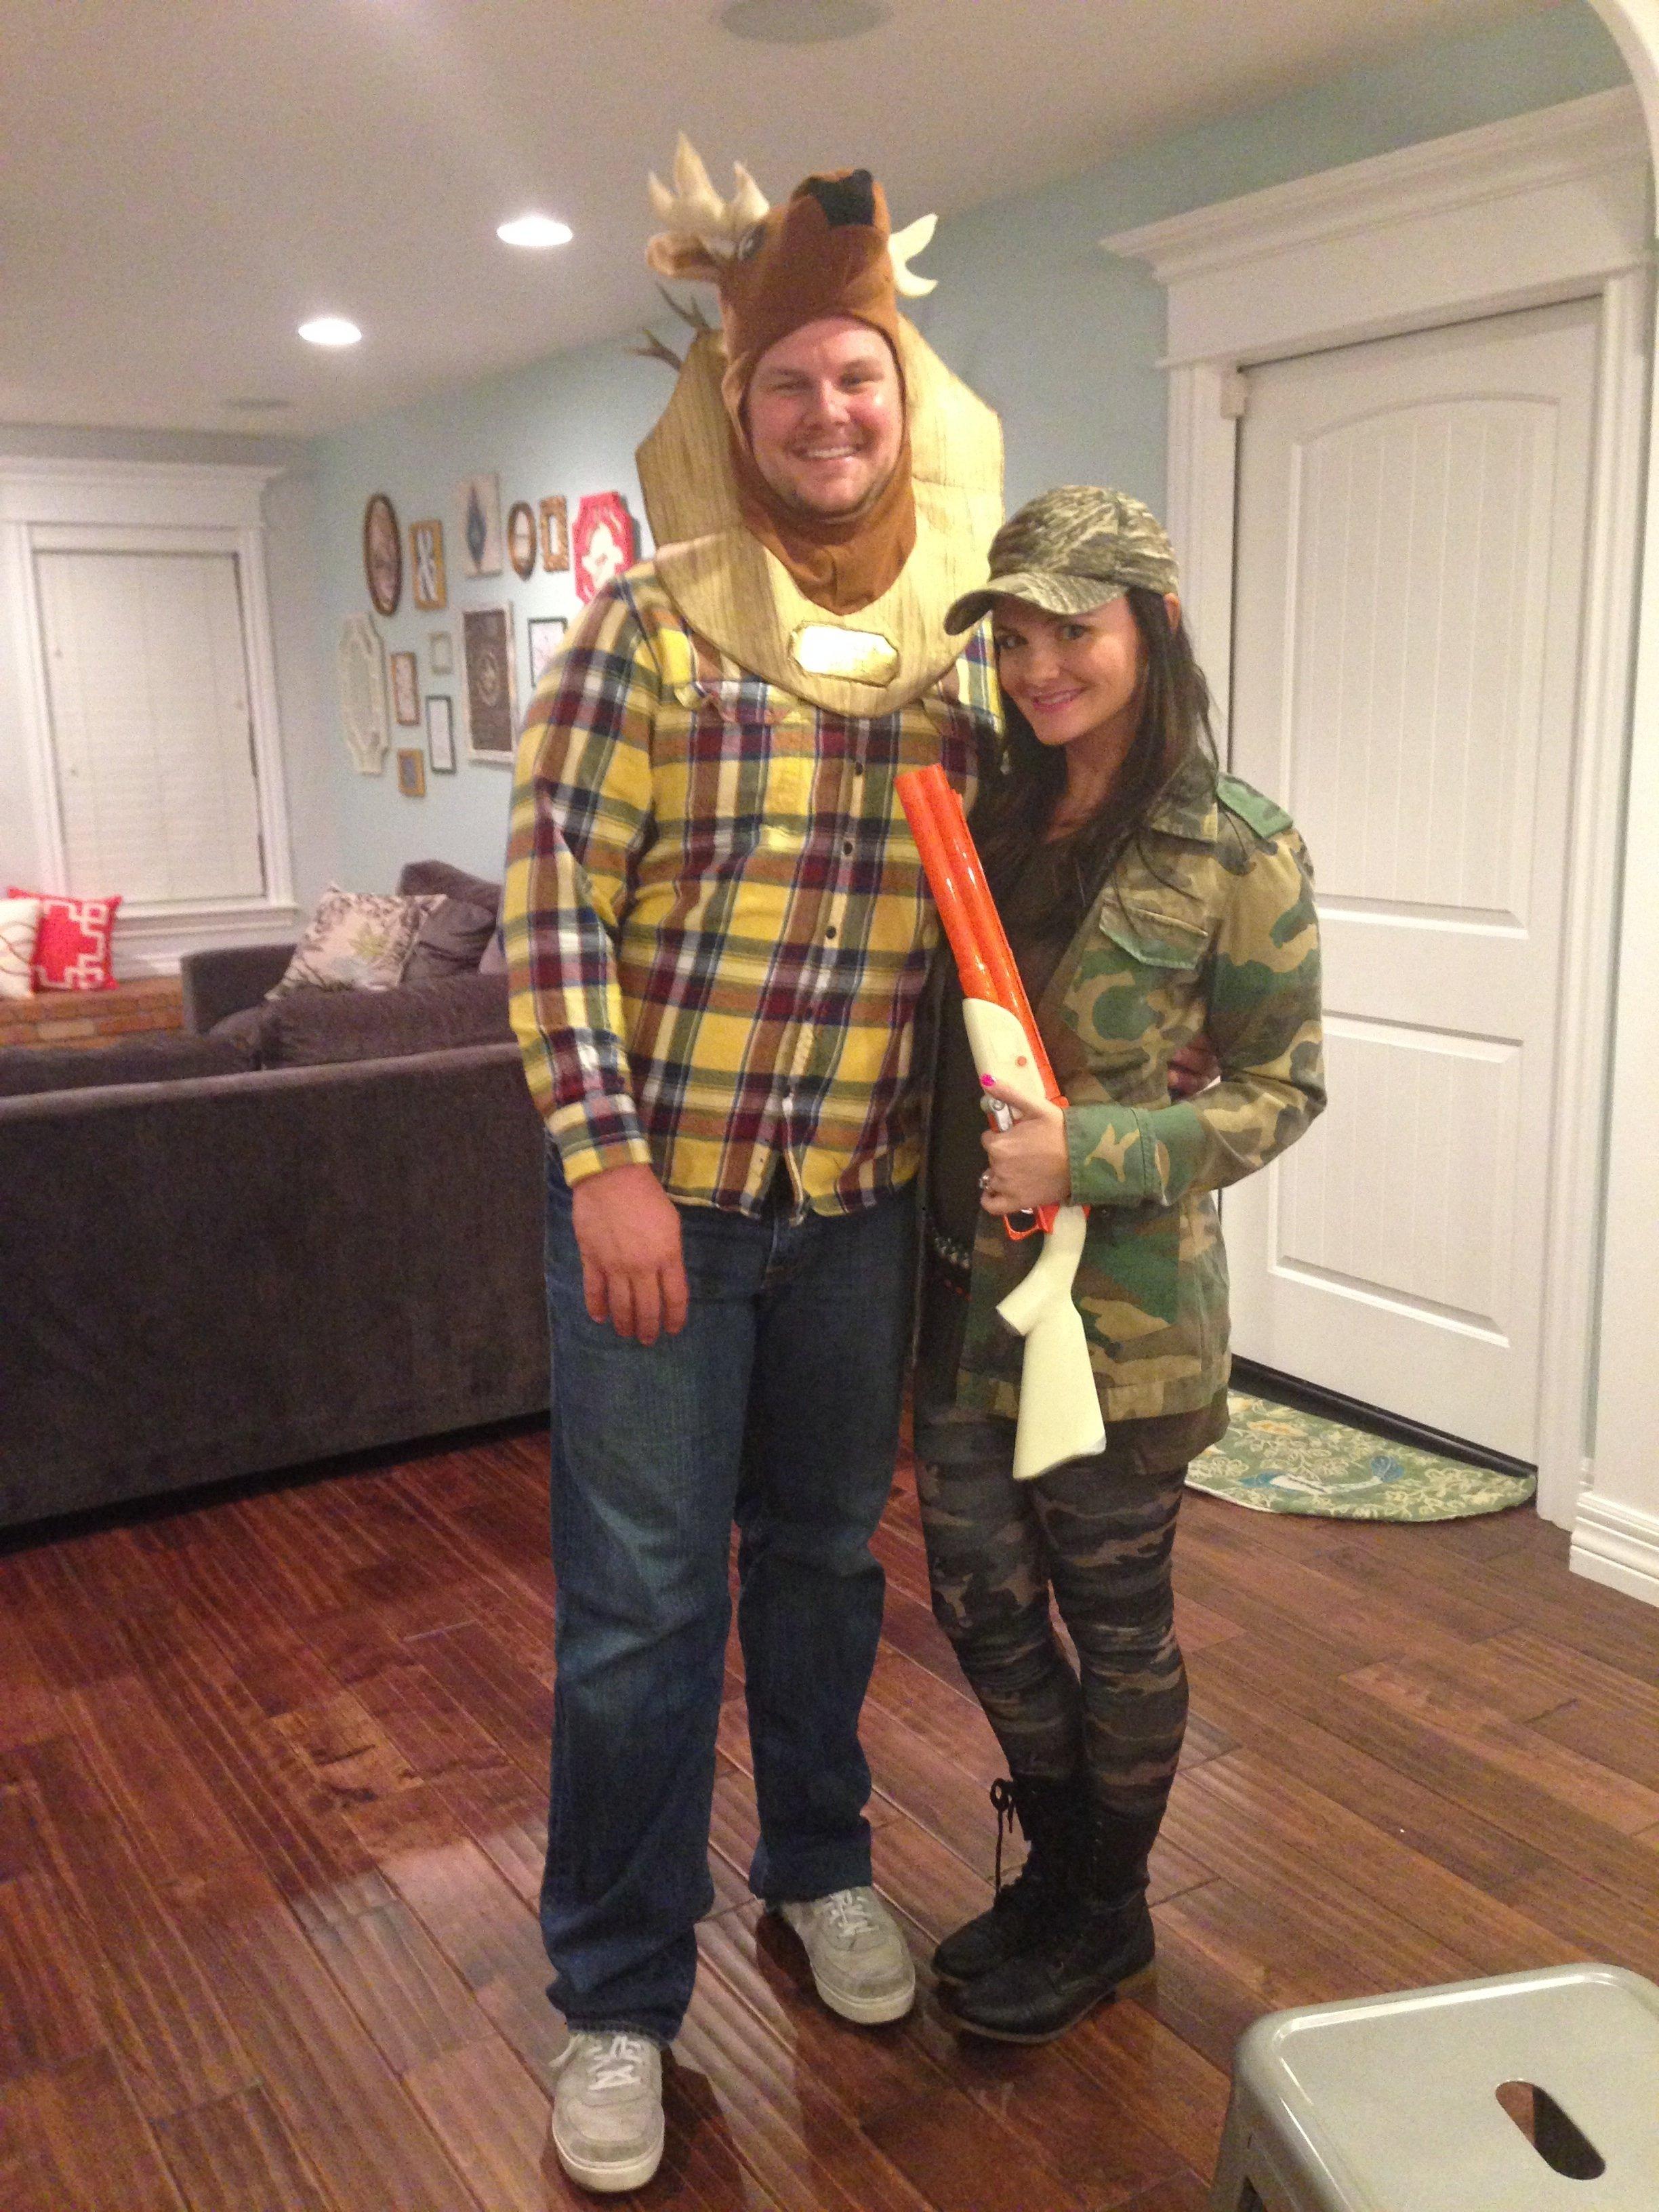 10 Cute Creative Ideas For Halloween Costumes creative award winning halloween costume ideas 2020